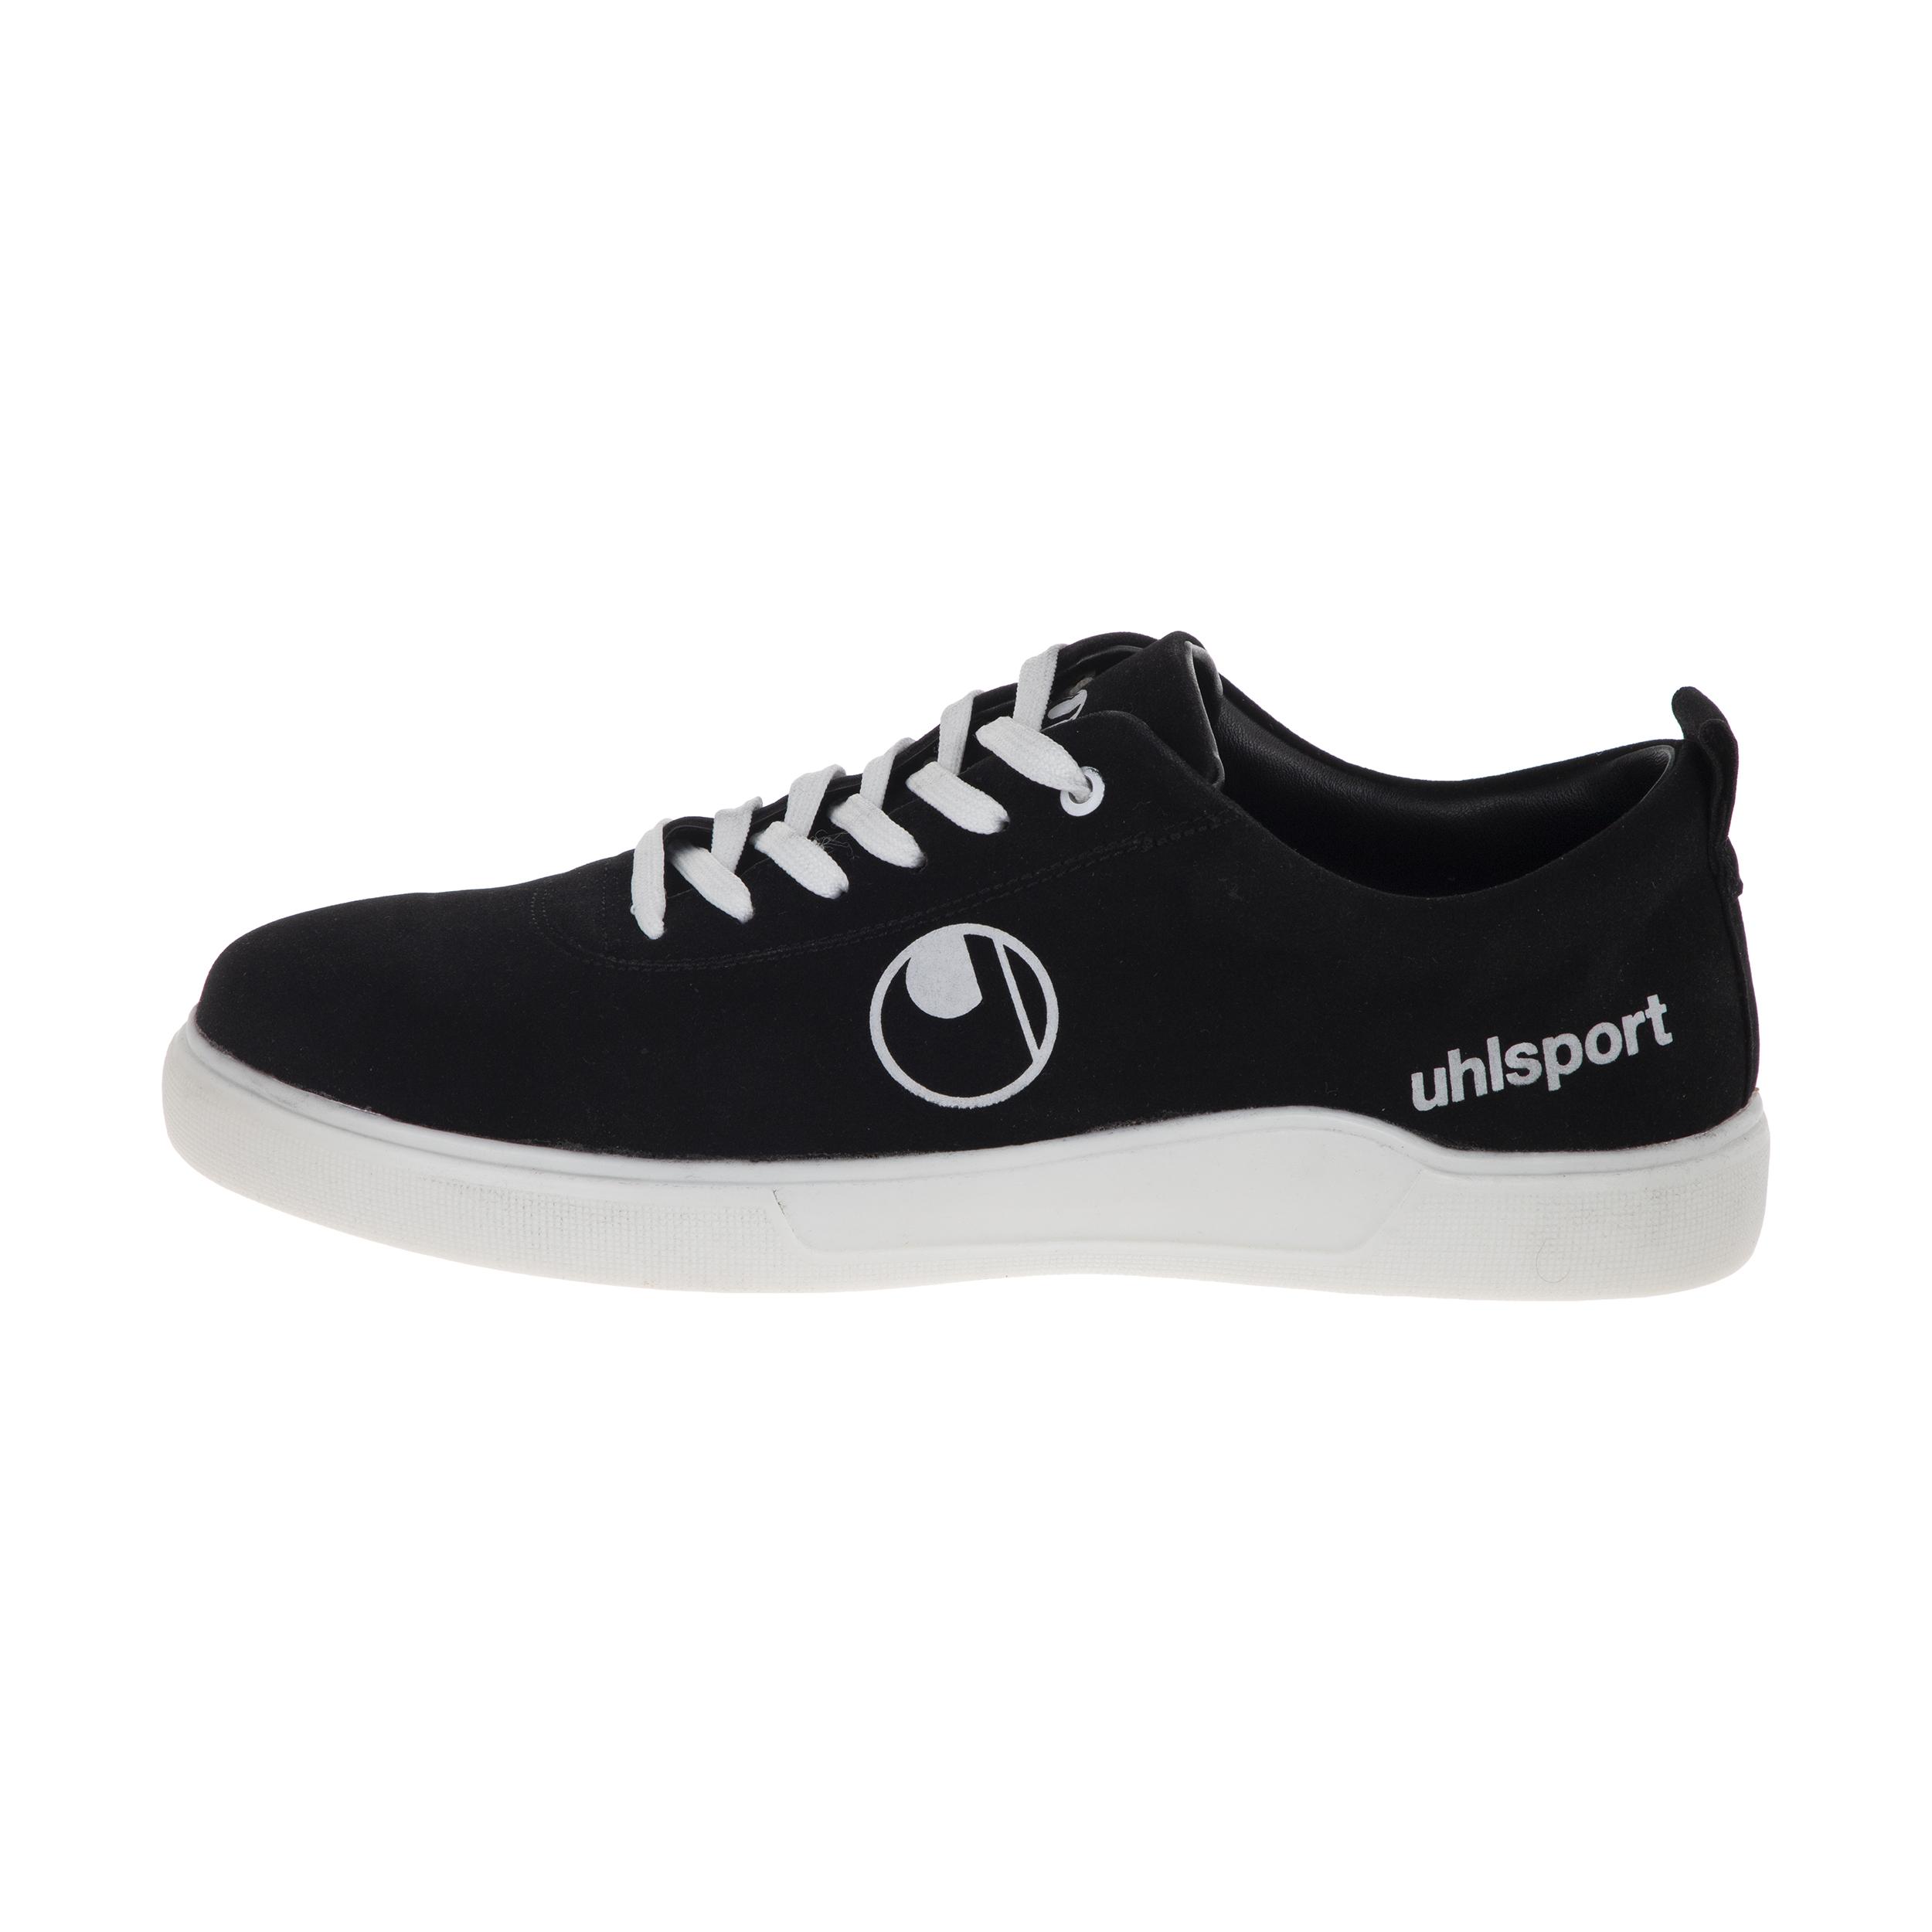 کفش مردانه آلشپرت کد MUH591-001